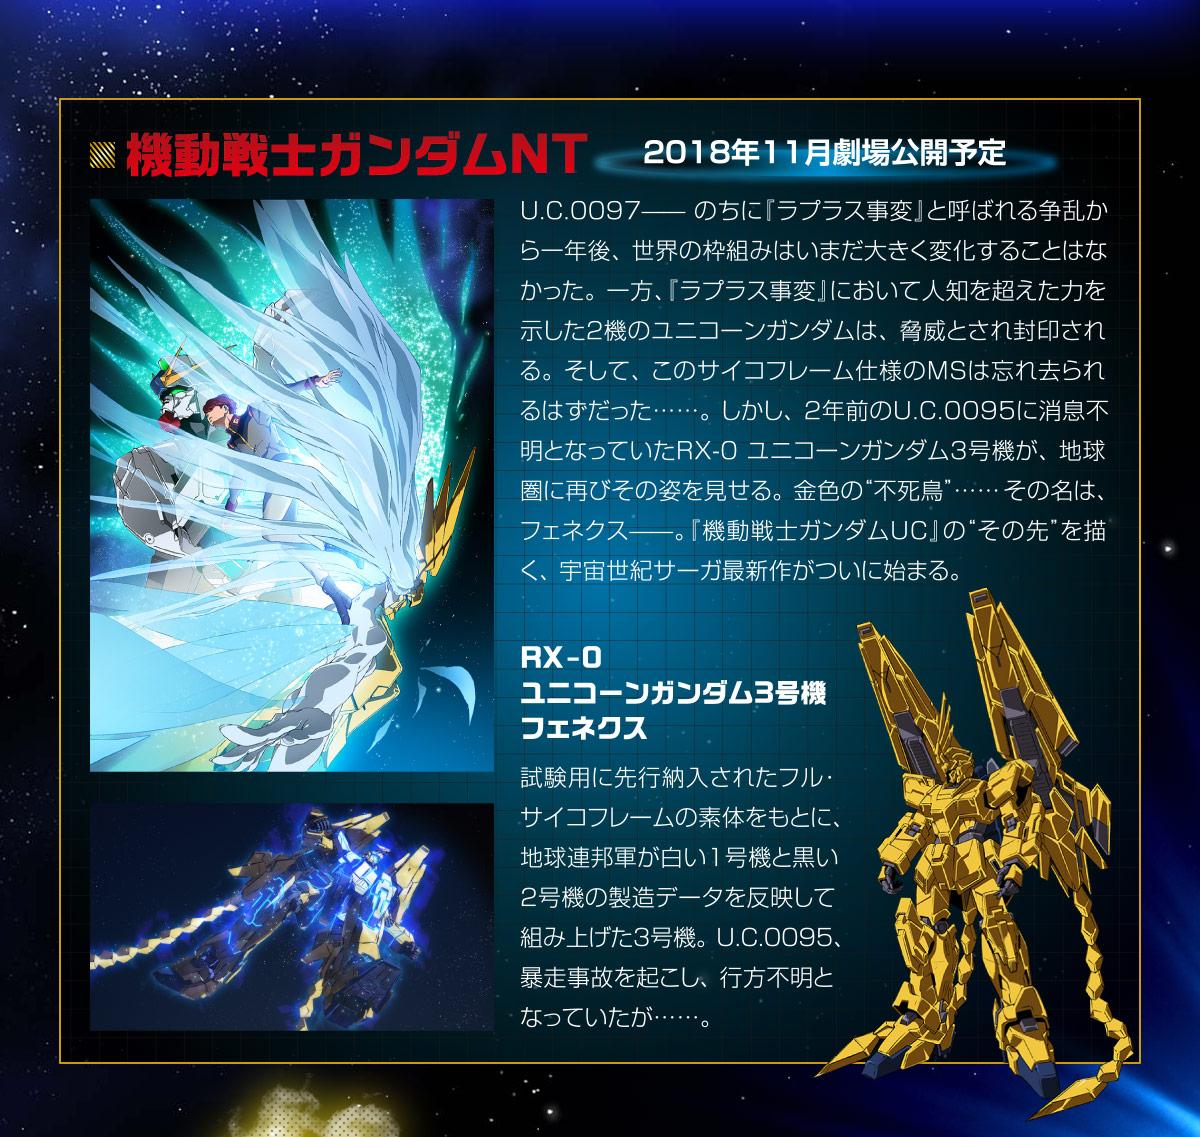 Gundam - Metal Robot Side MS (Bandai) - Page 6 8suZBJPq_o